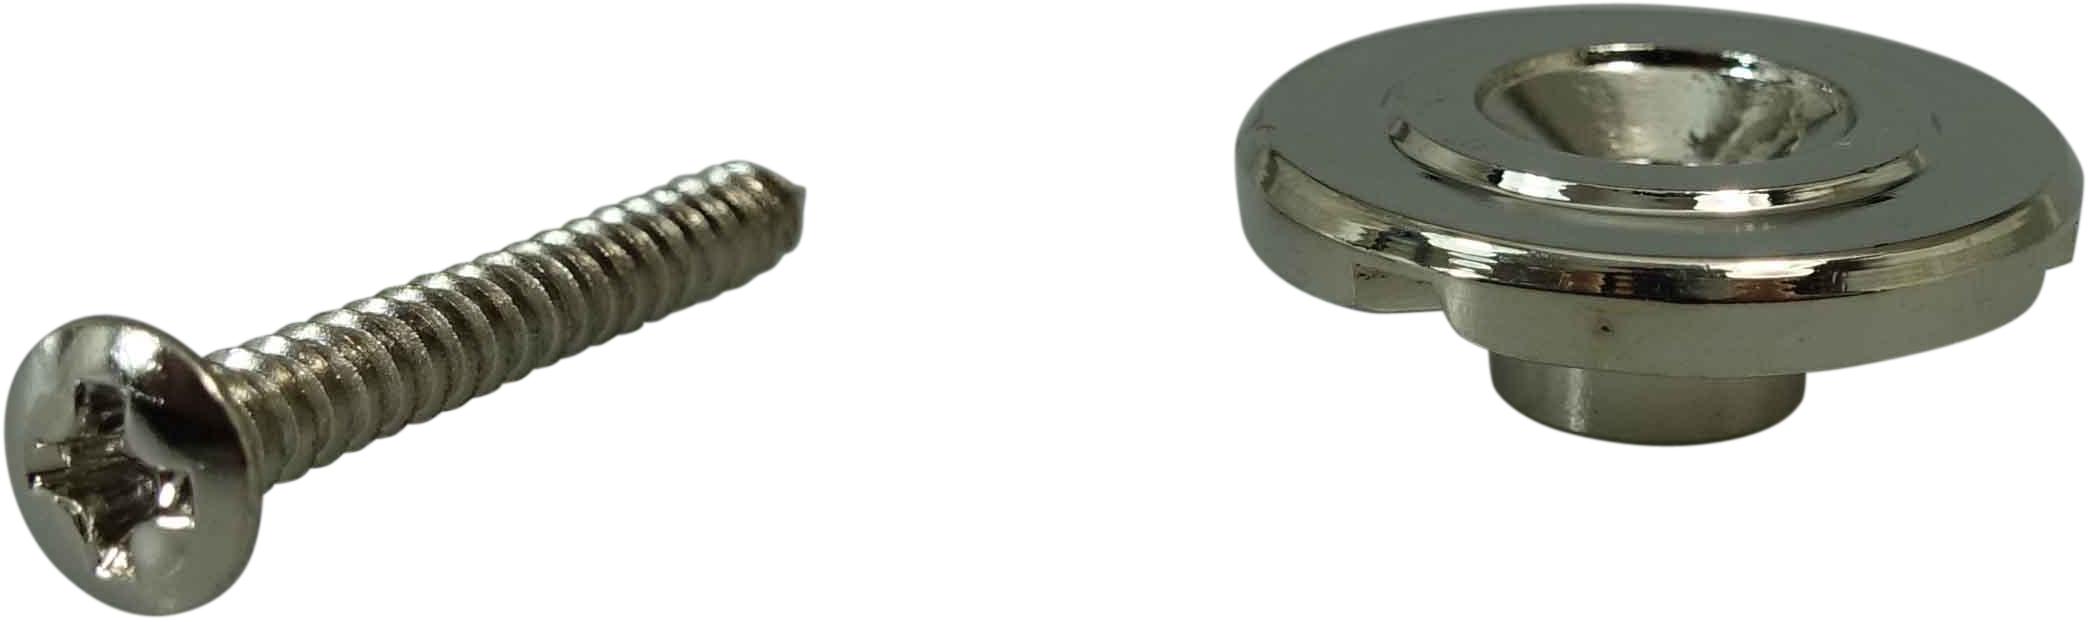 Toronzo String Retainer BS-Nickel